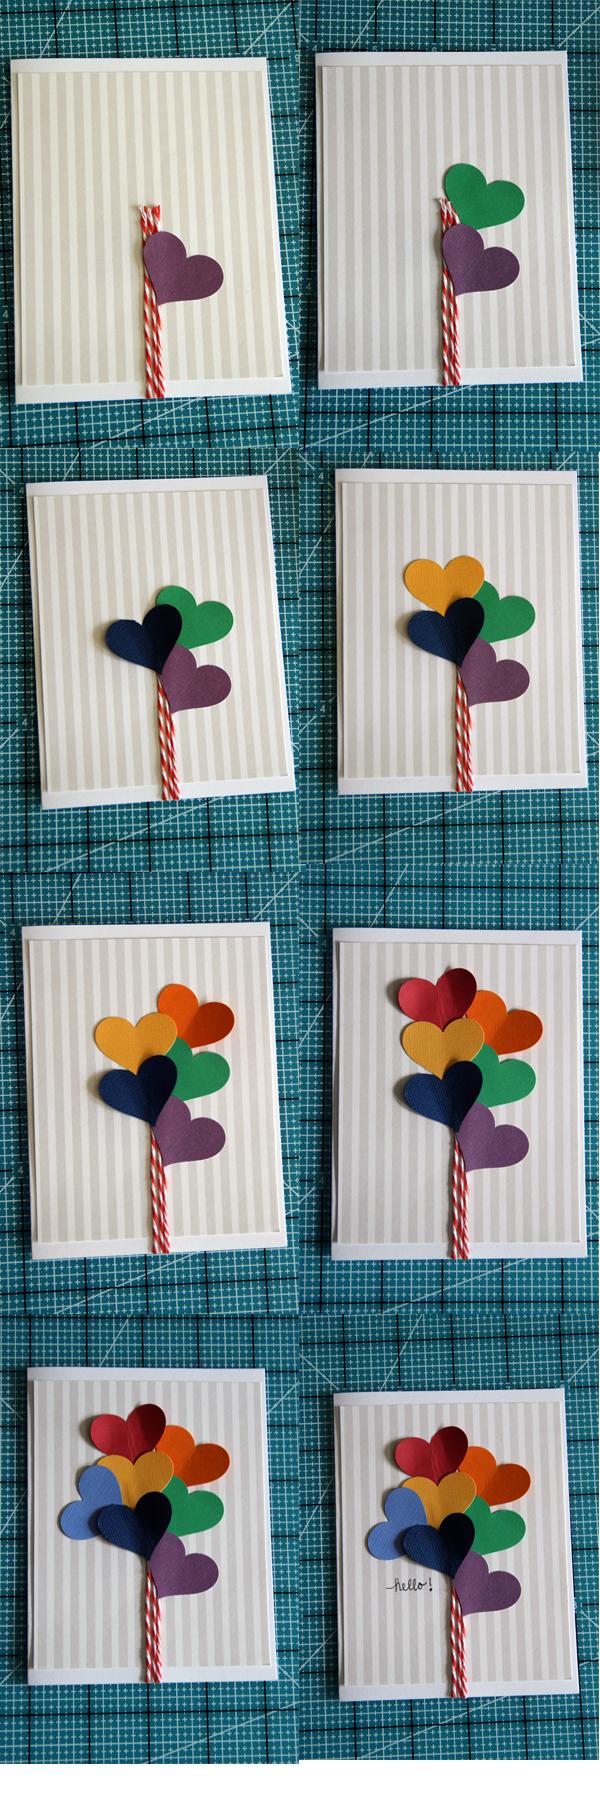 Macm.rainbowballoons.022